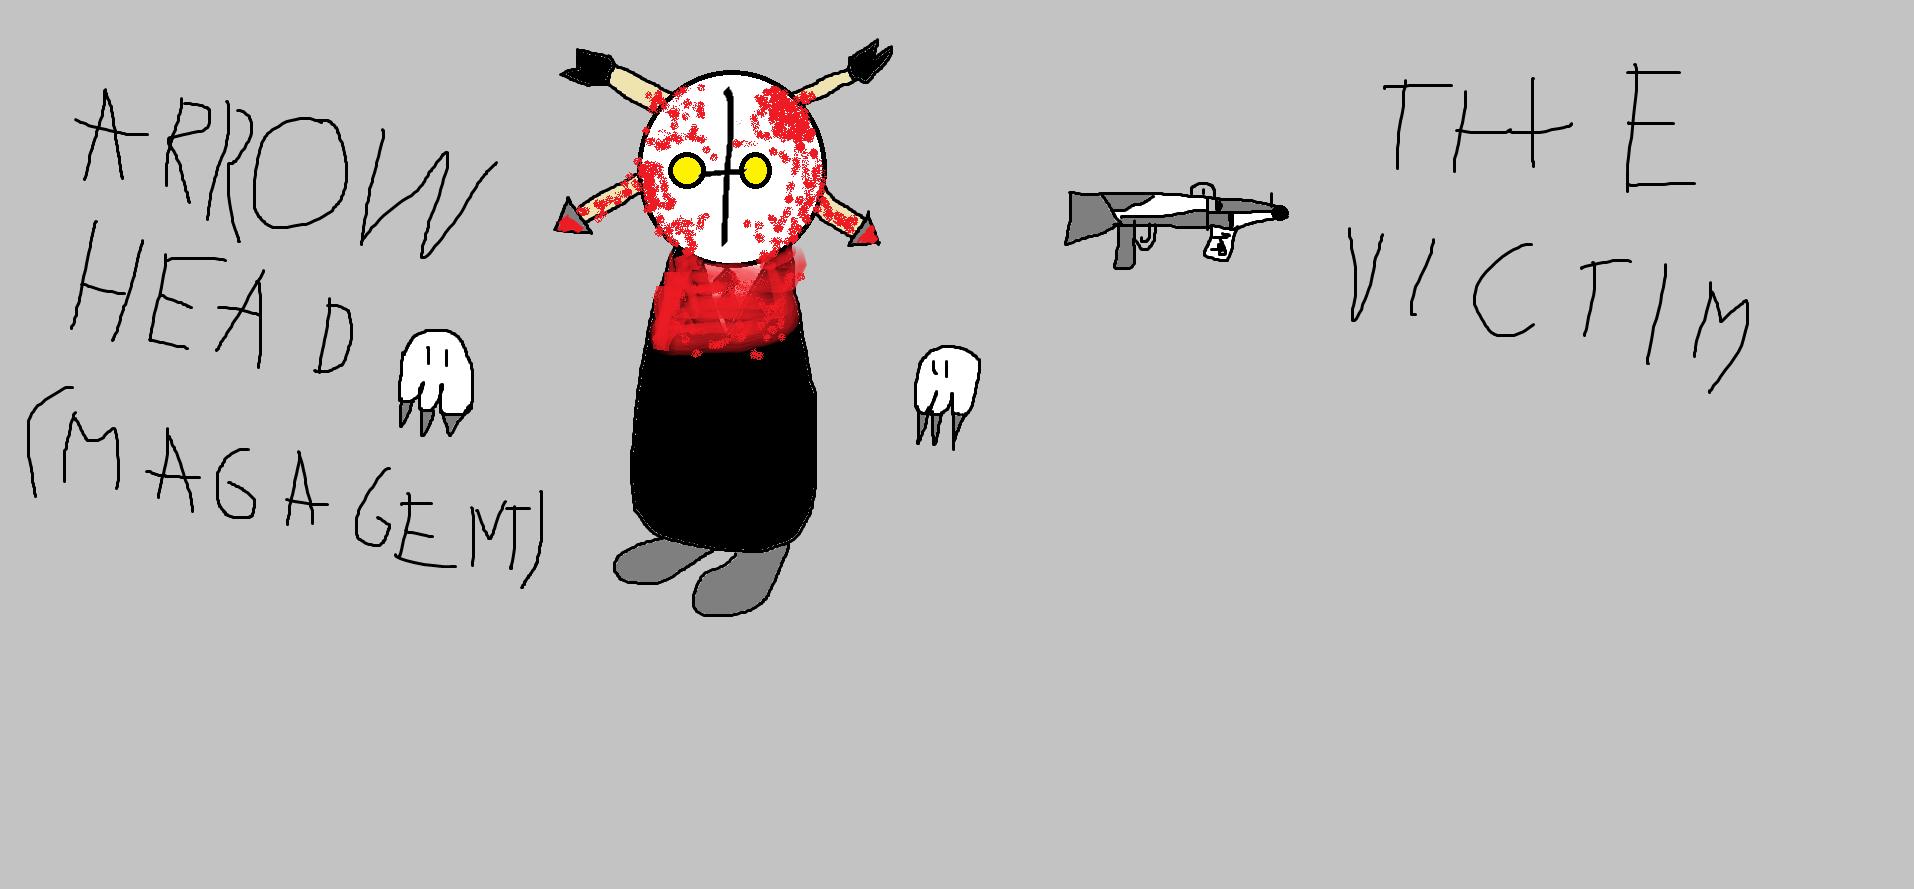 arrorhead mag agent